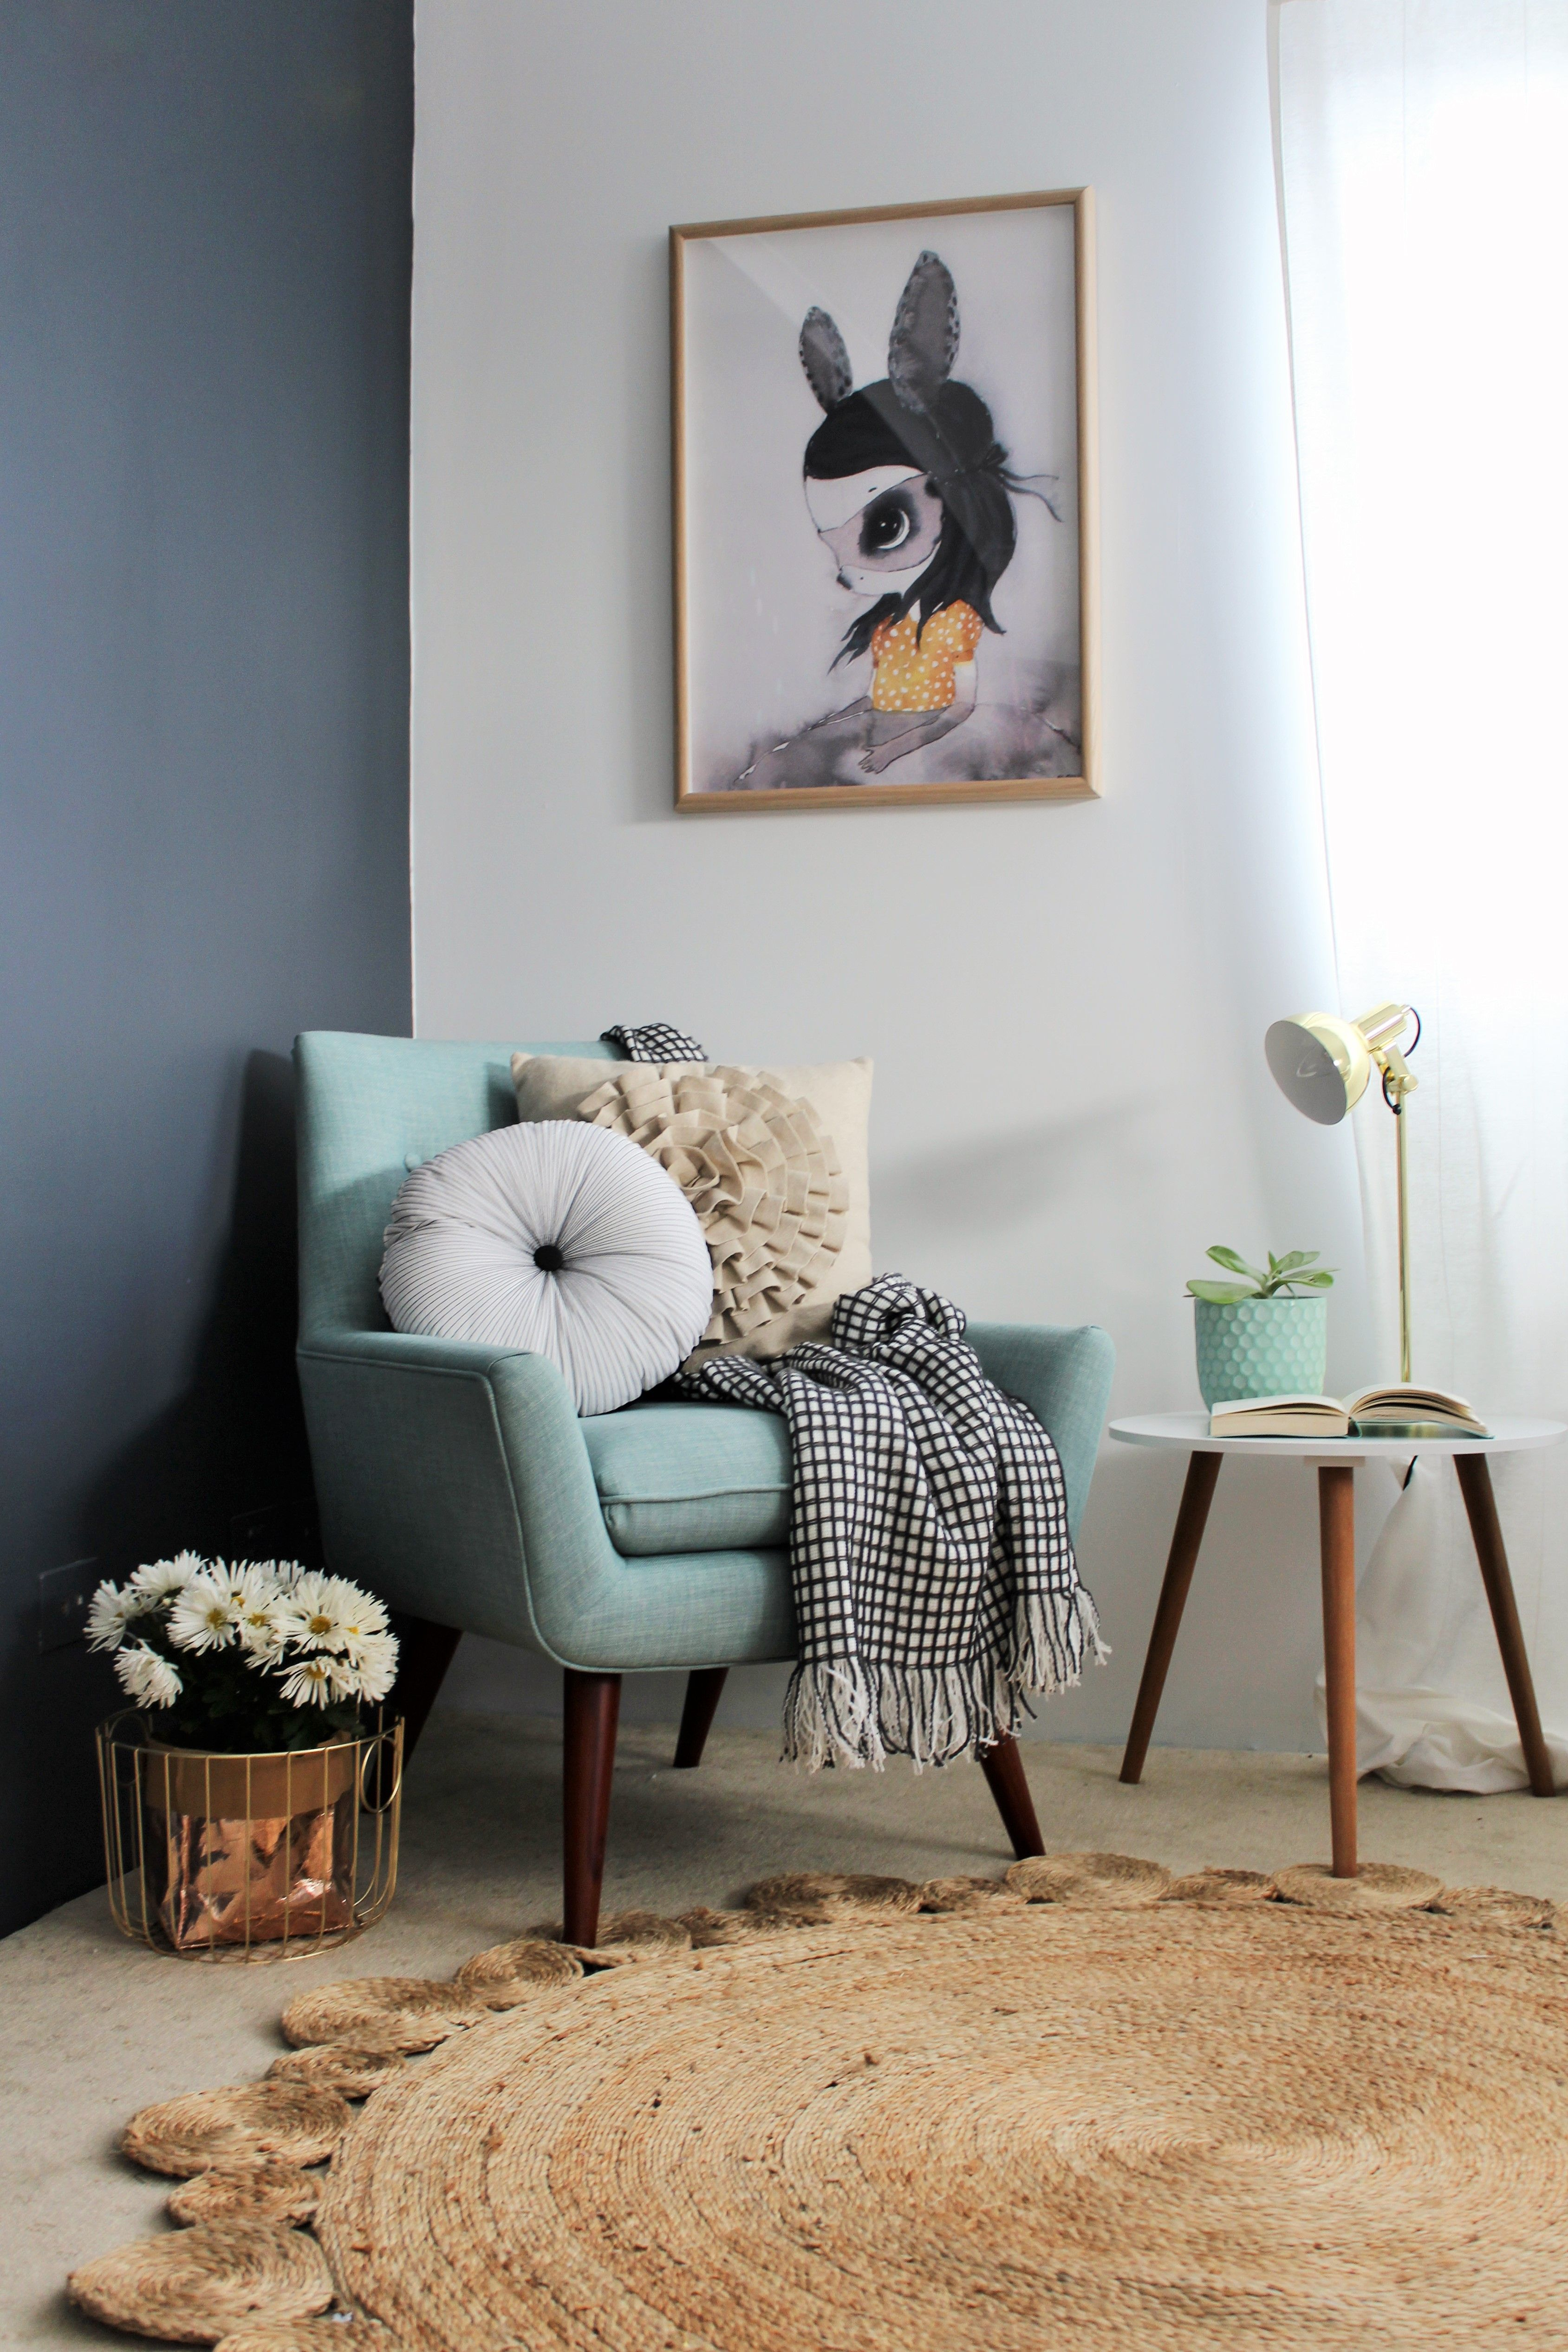 Decorating bedroom simple interiors  amazing interior decor finds from target australia